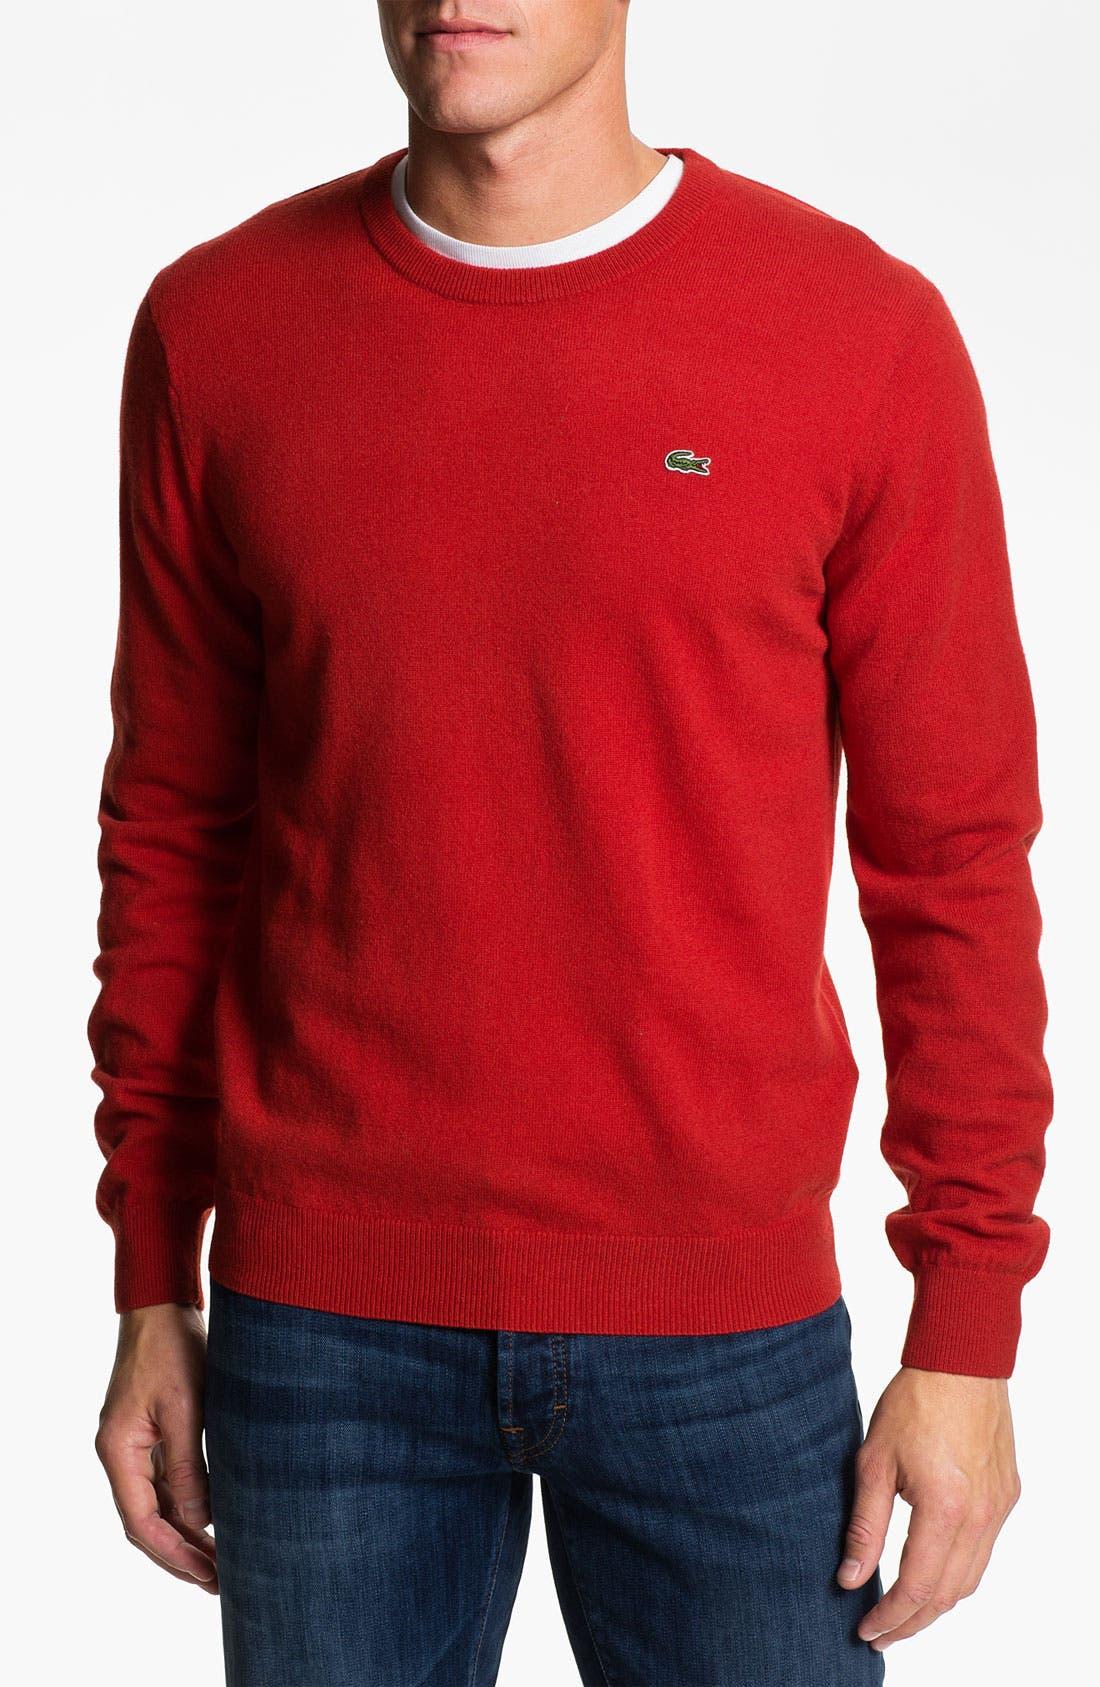 Main Image - Lacoste Crewneck Wool Sweater